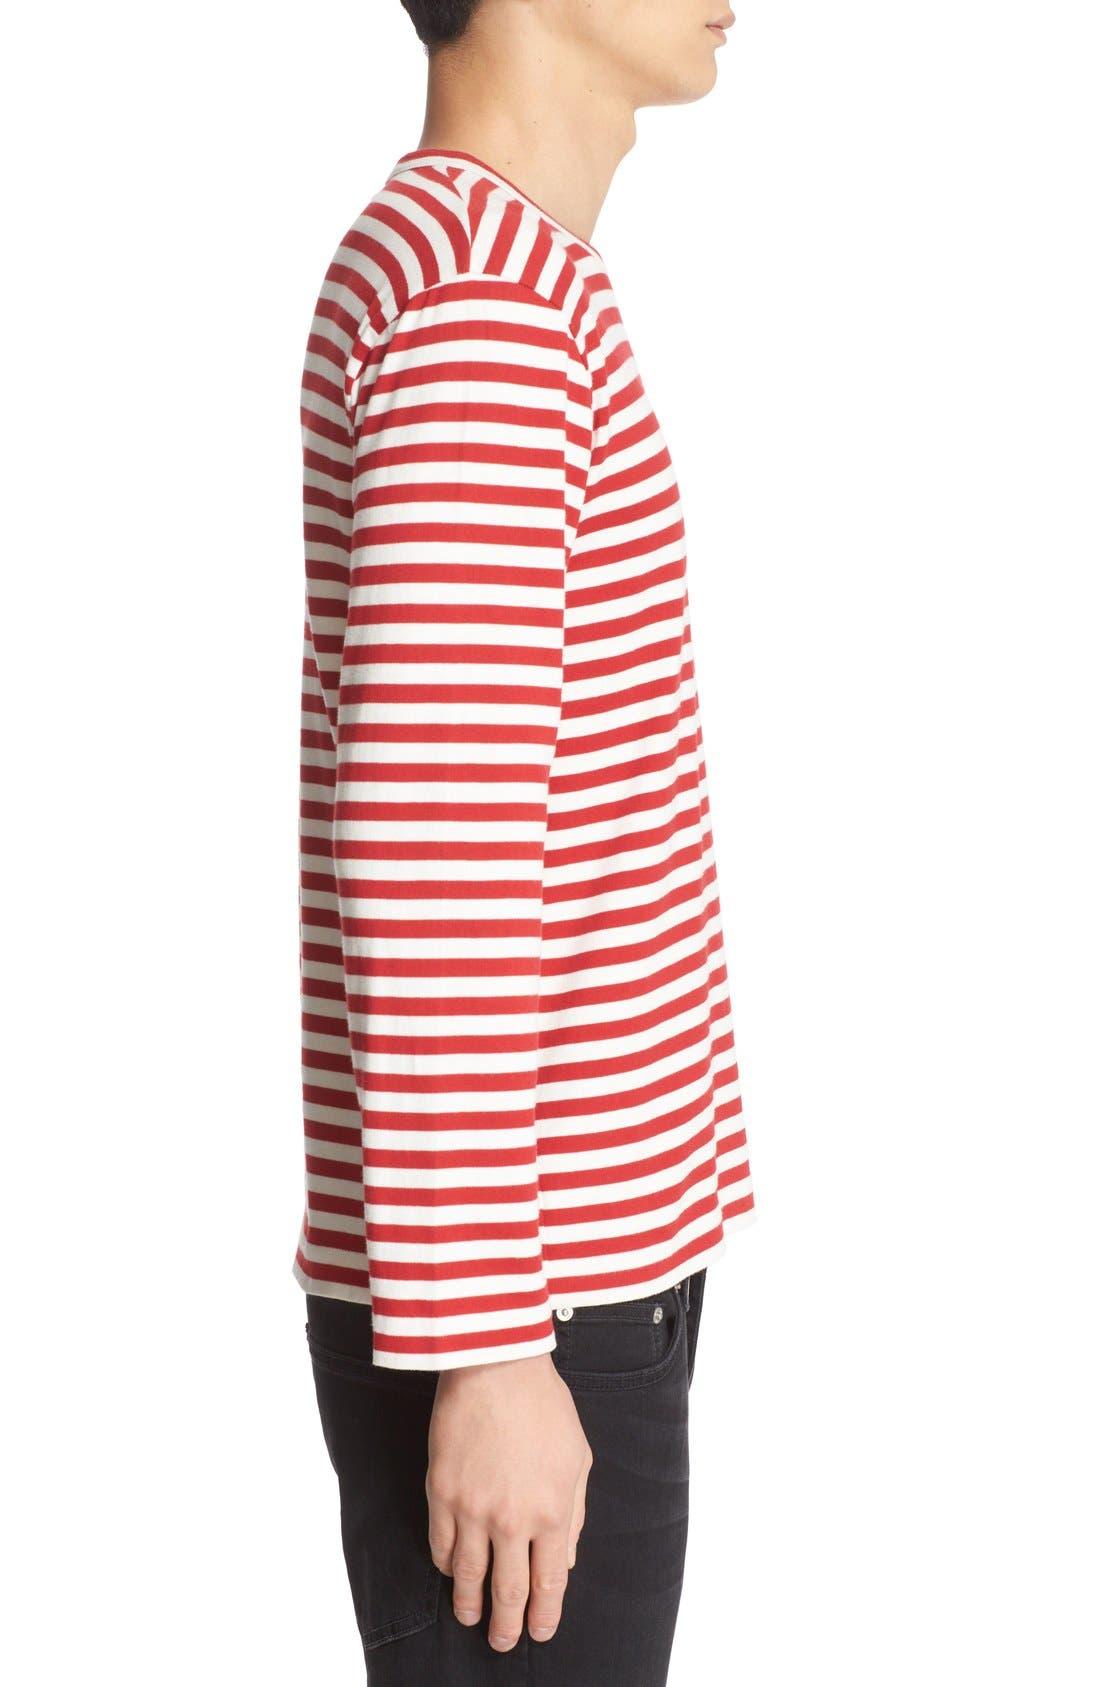 Comme des Garçons PLAY Stripe Long Sleeve T-Shirt,                             Alternate thumbnail 3, color,                             Red/ White